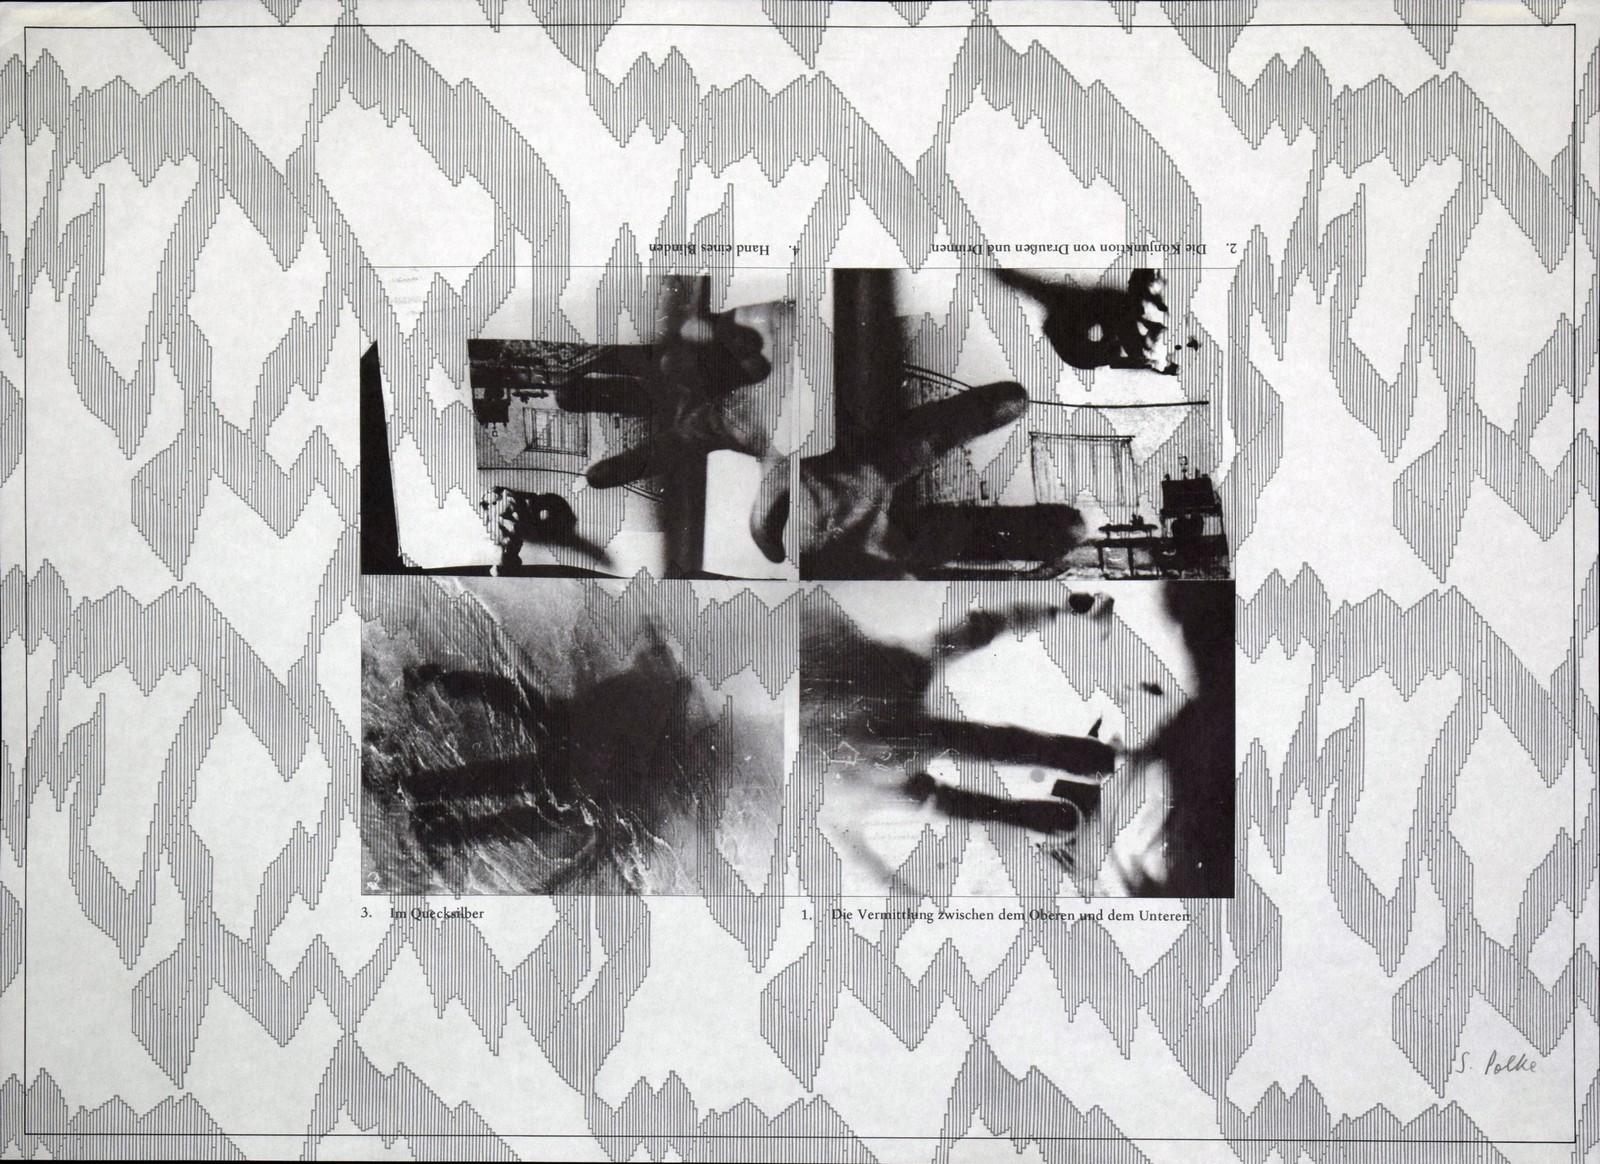 1973, offset print, 45,2 x 62,7 cm